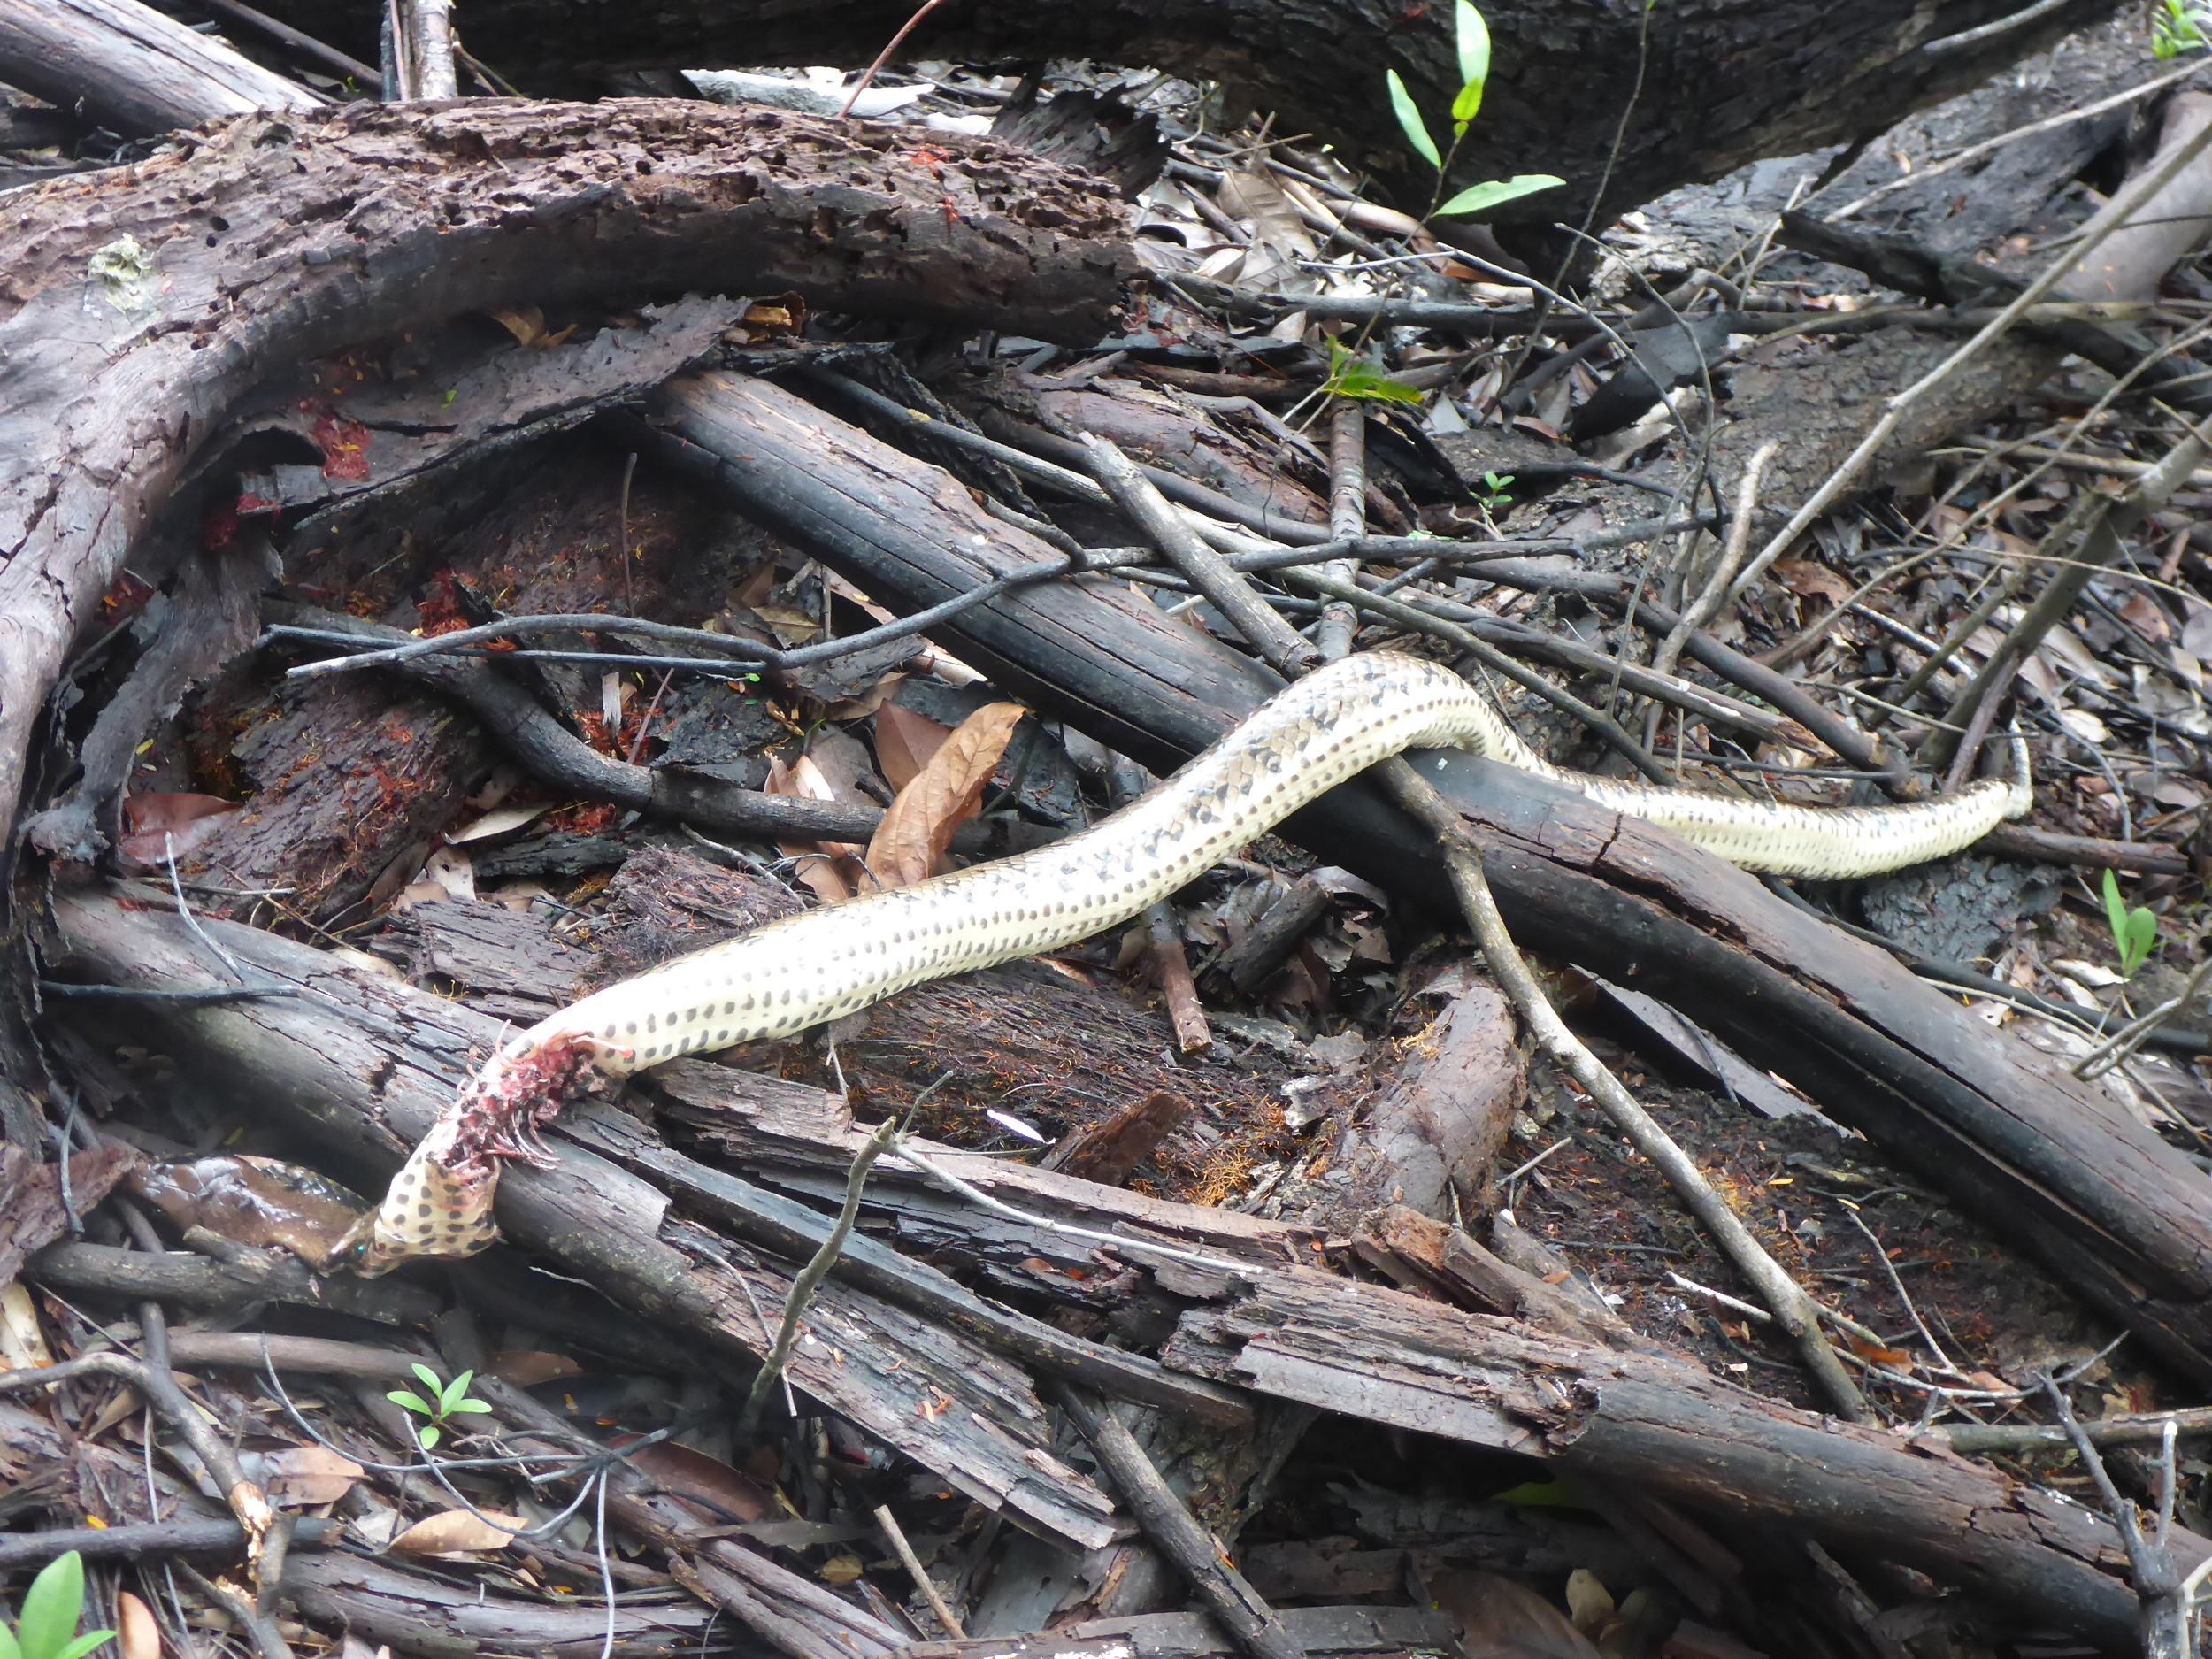 the dead anacondaa